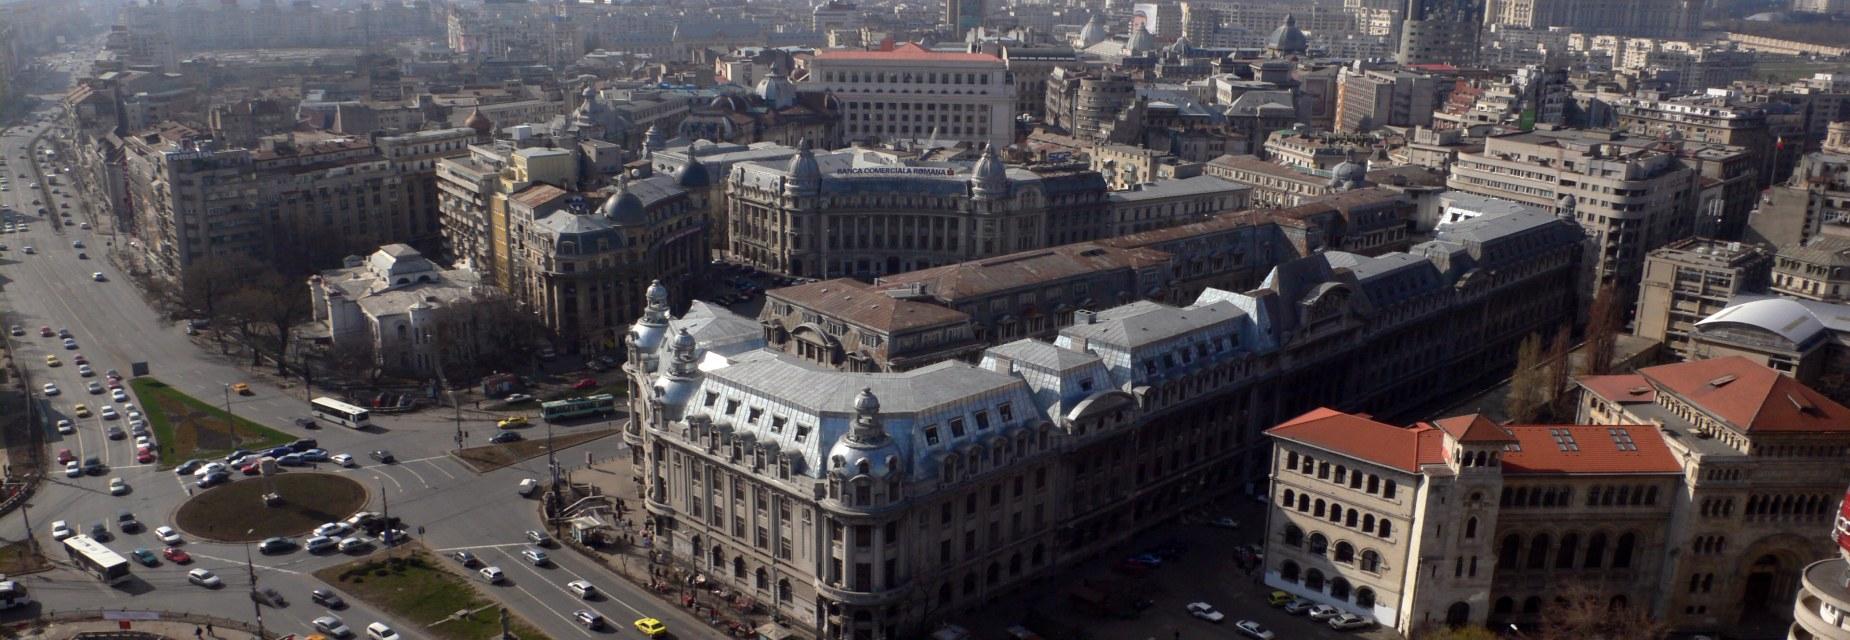 Bucharest, Romania | LAGARDERE ACTIVE